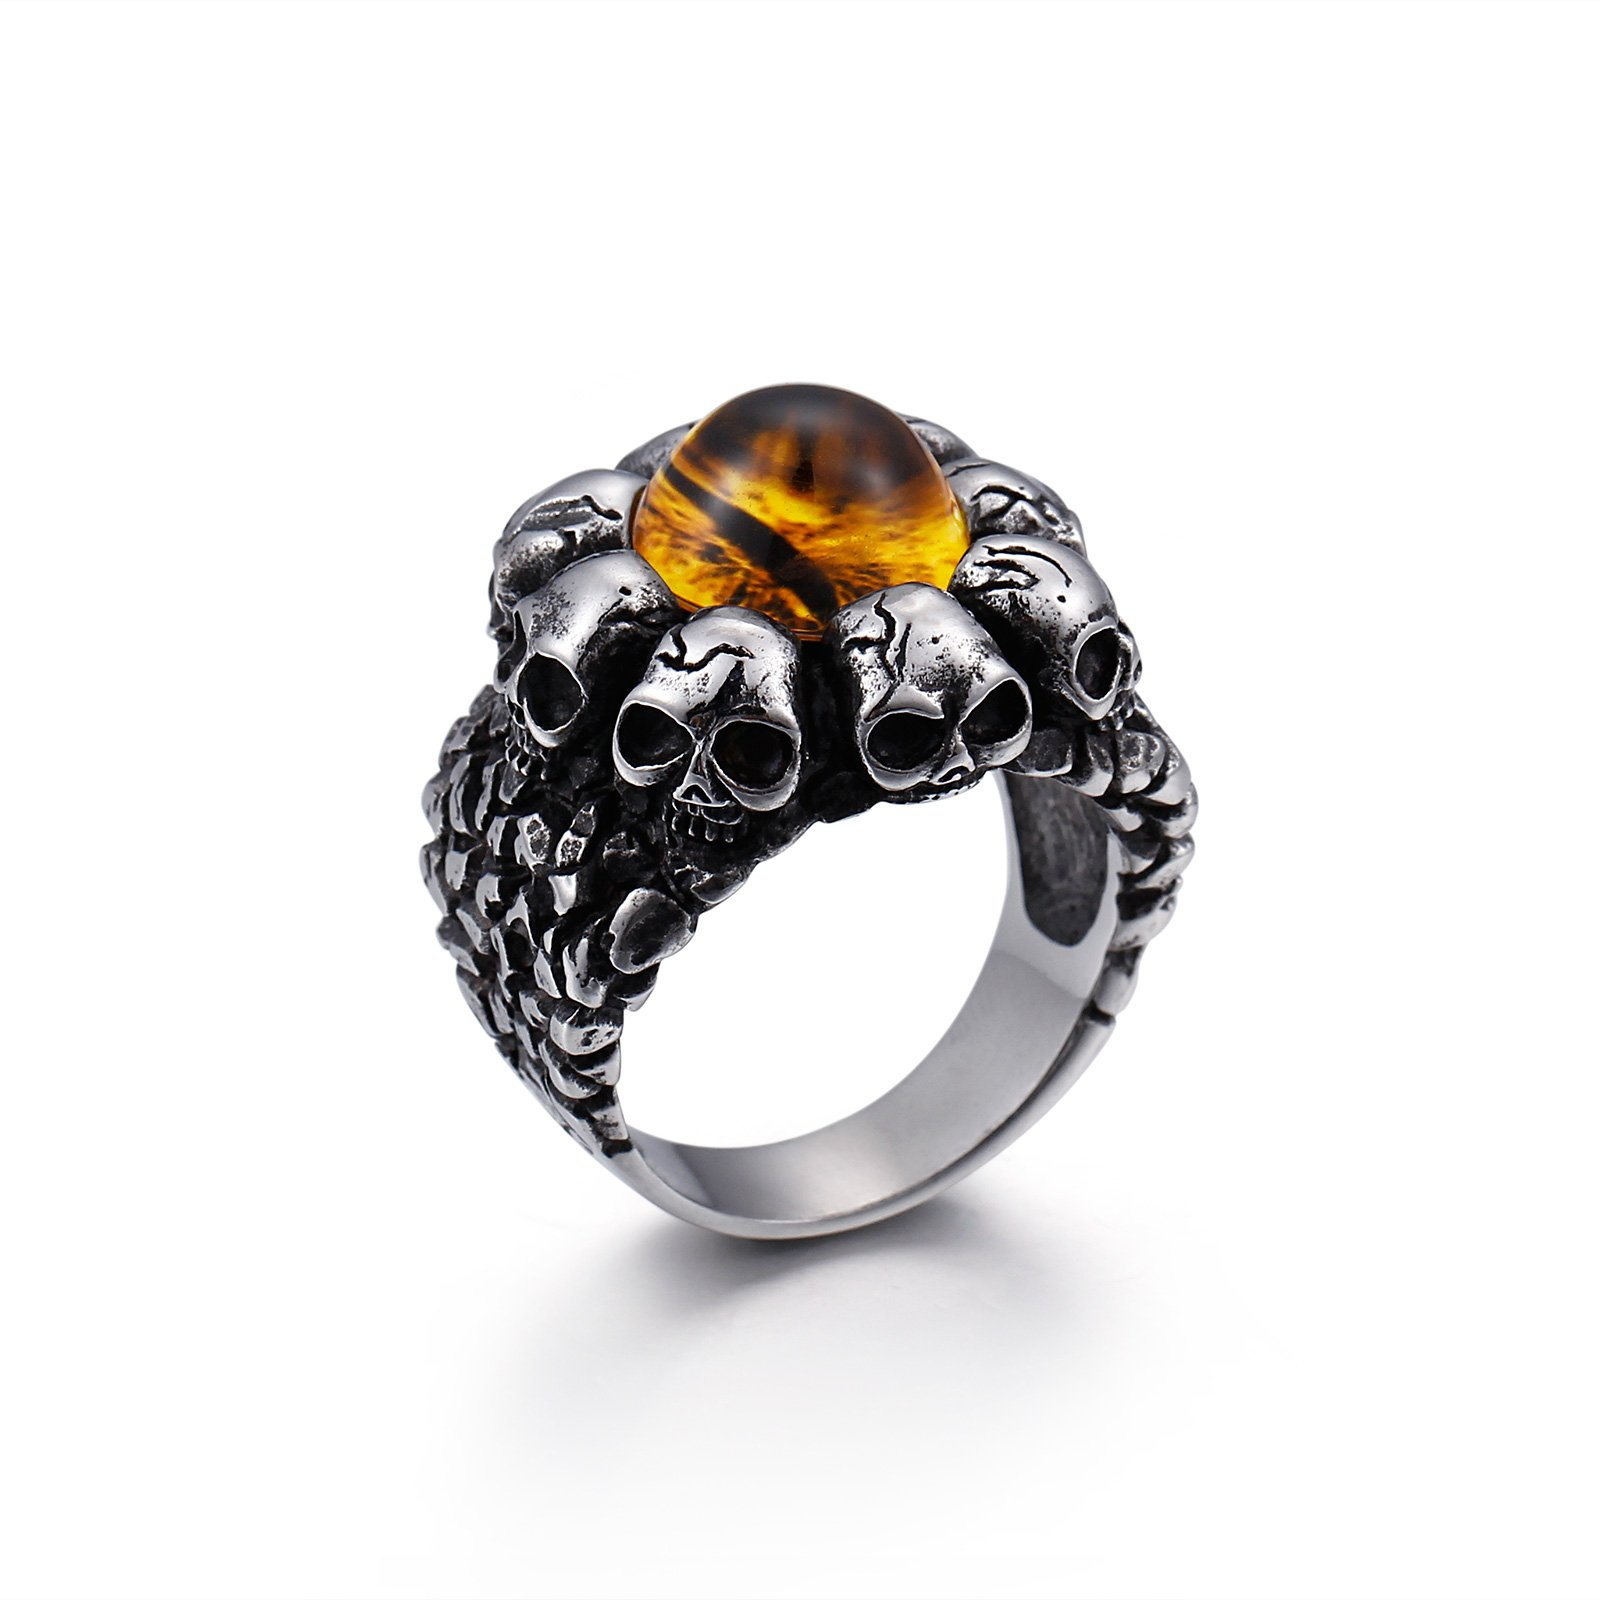 UNISS Vintage Yellow Devils Eye Rings for Men Stainless Steel Band Rings Silver Black Skulls Punk Rings Size 10